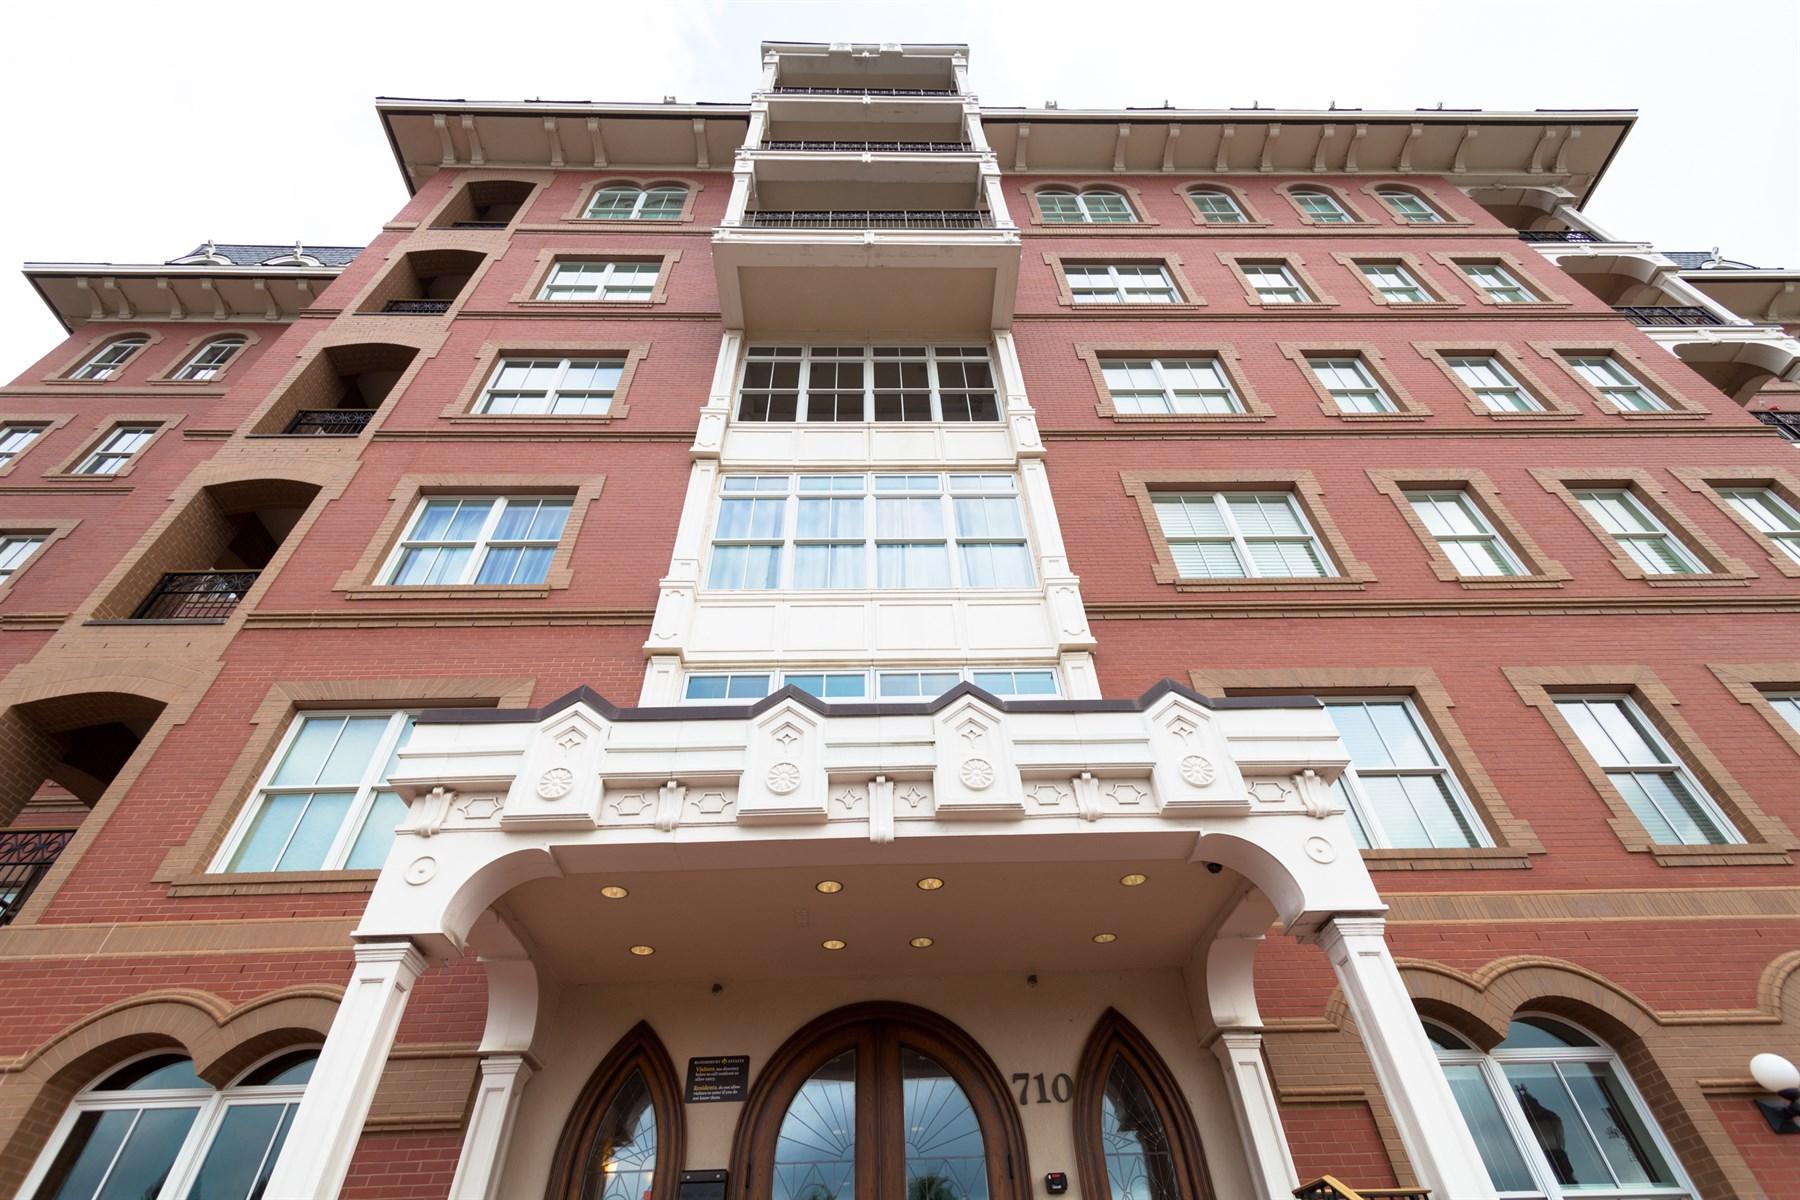 Condominium for Sale at Bloomsbury Estates 710 Independence Place Unit # 208 Raleigh, North Carolina 27603 United States